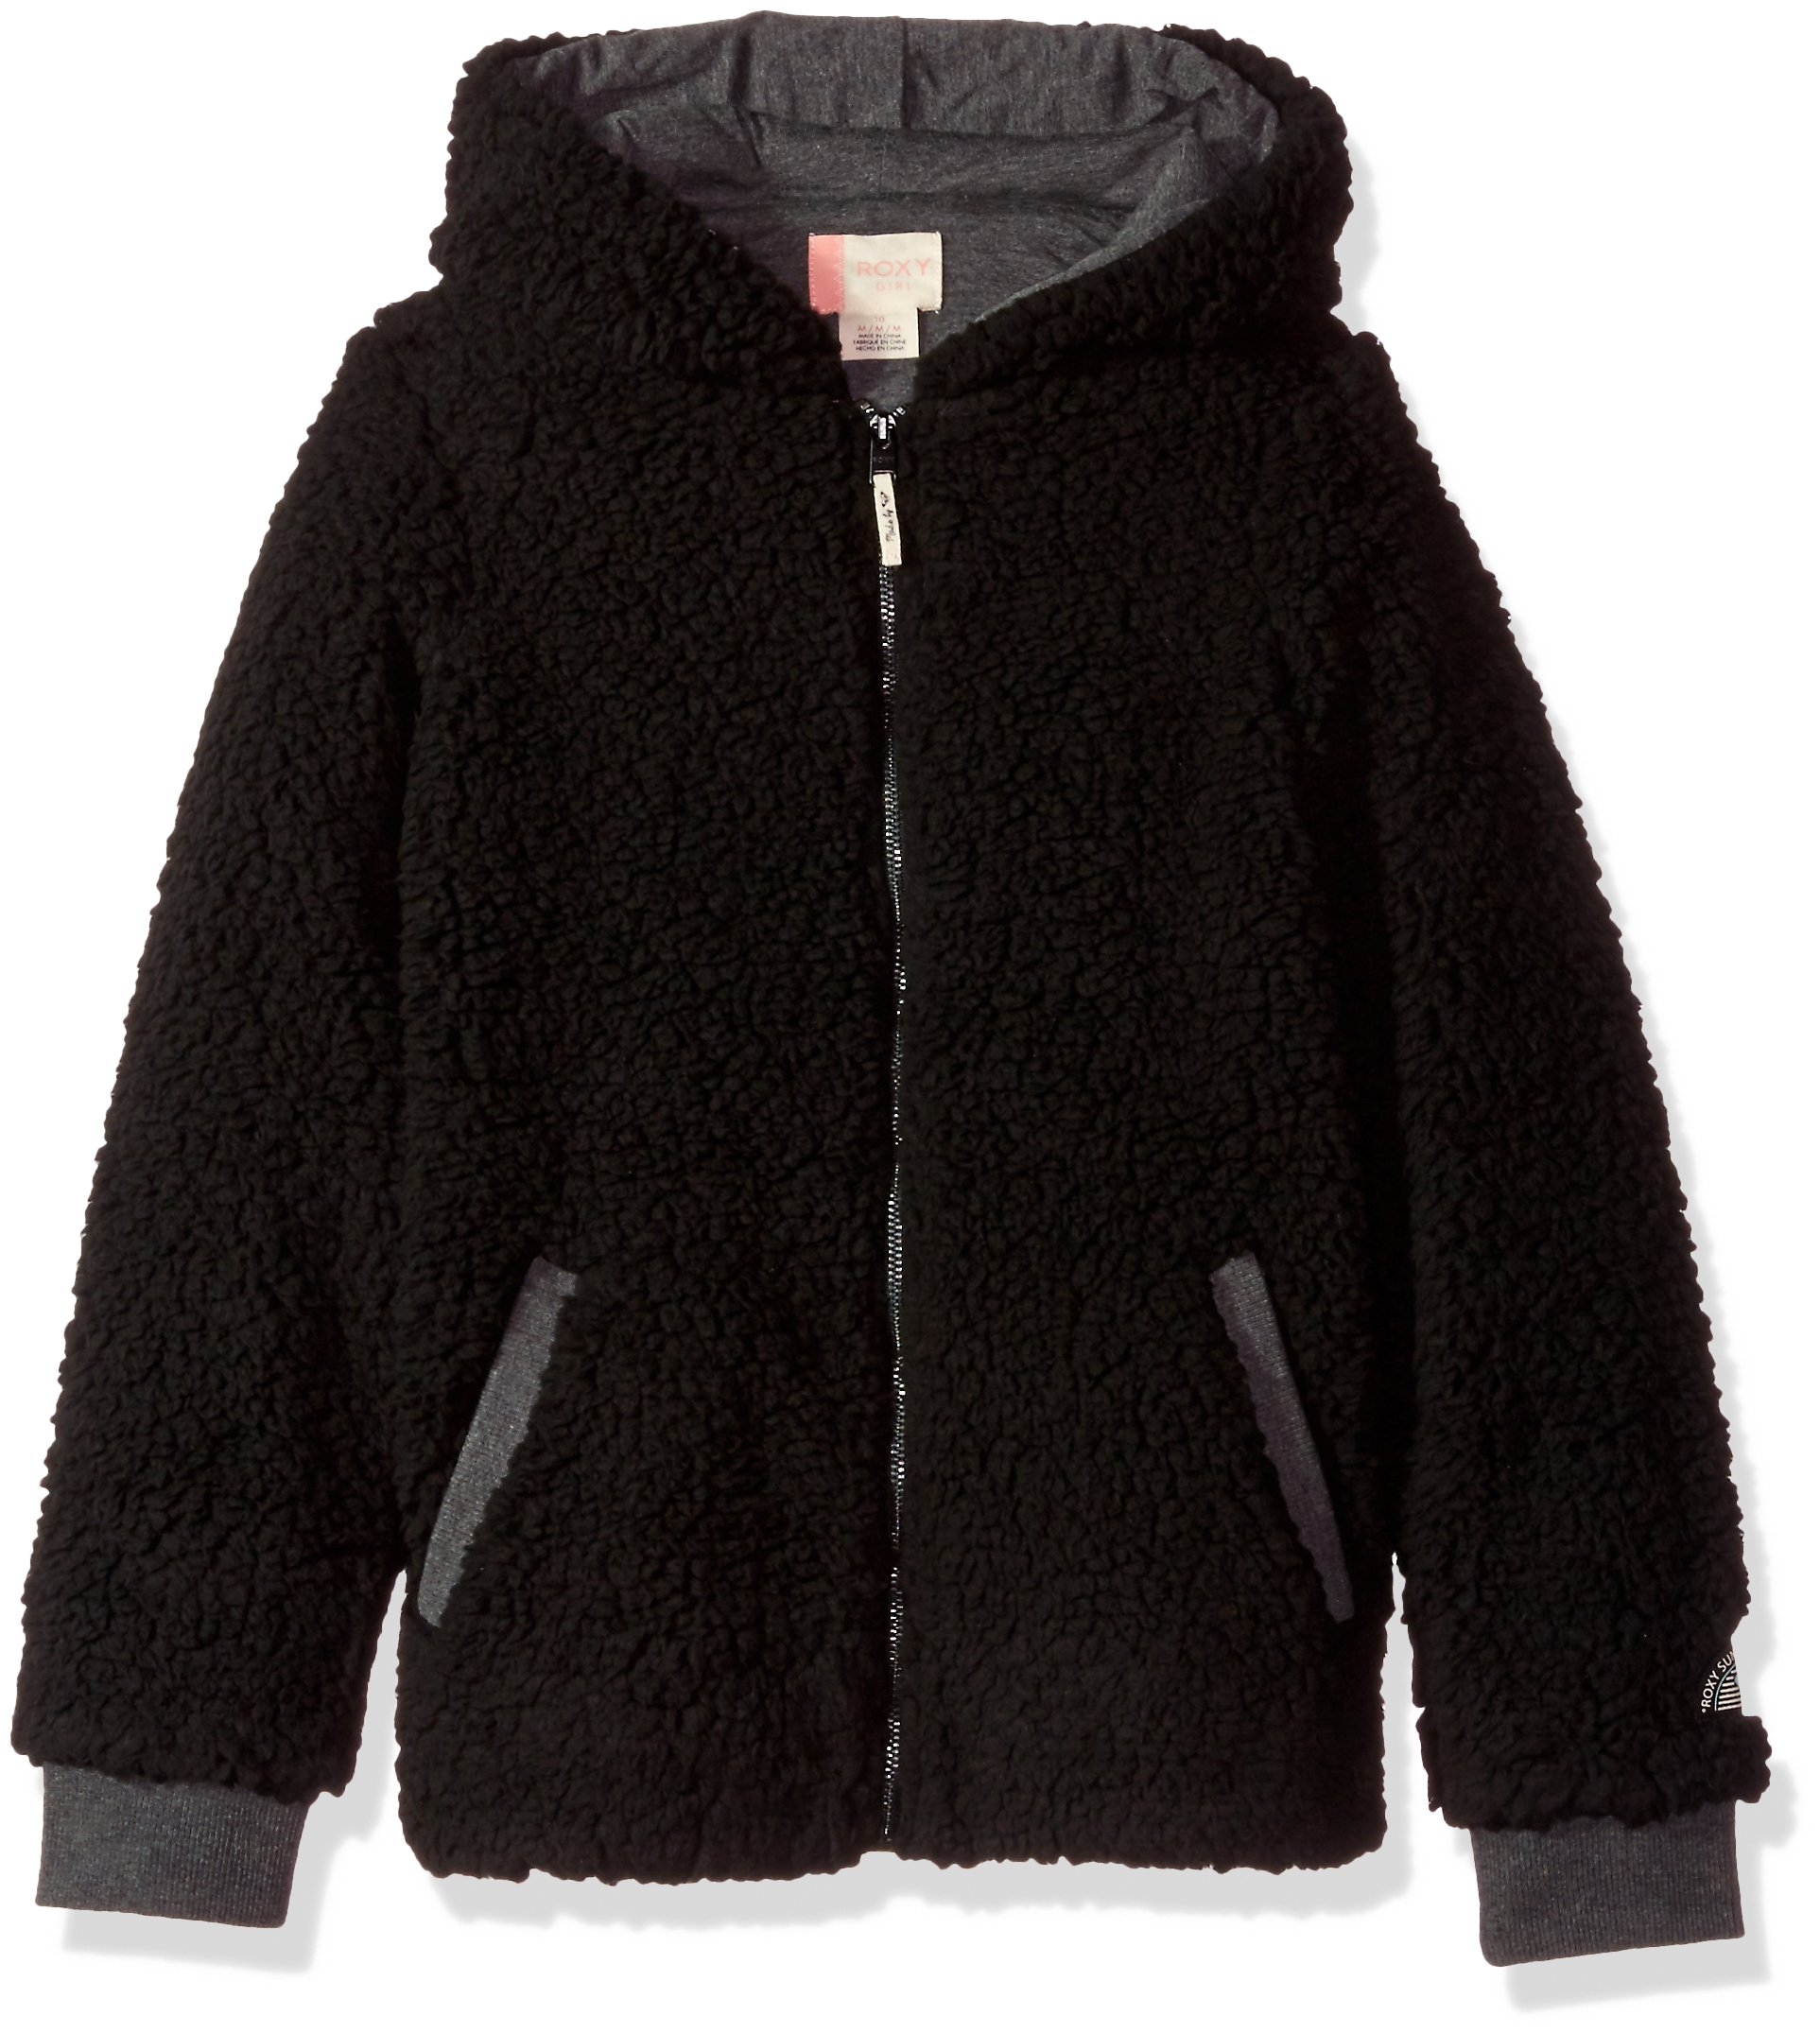 Roxy Big Girls' Fashion Sherpa Sweatshirt, Charcoal Heather, 10/M